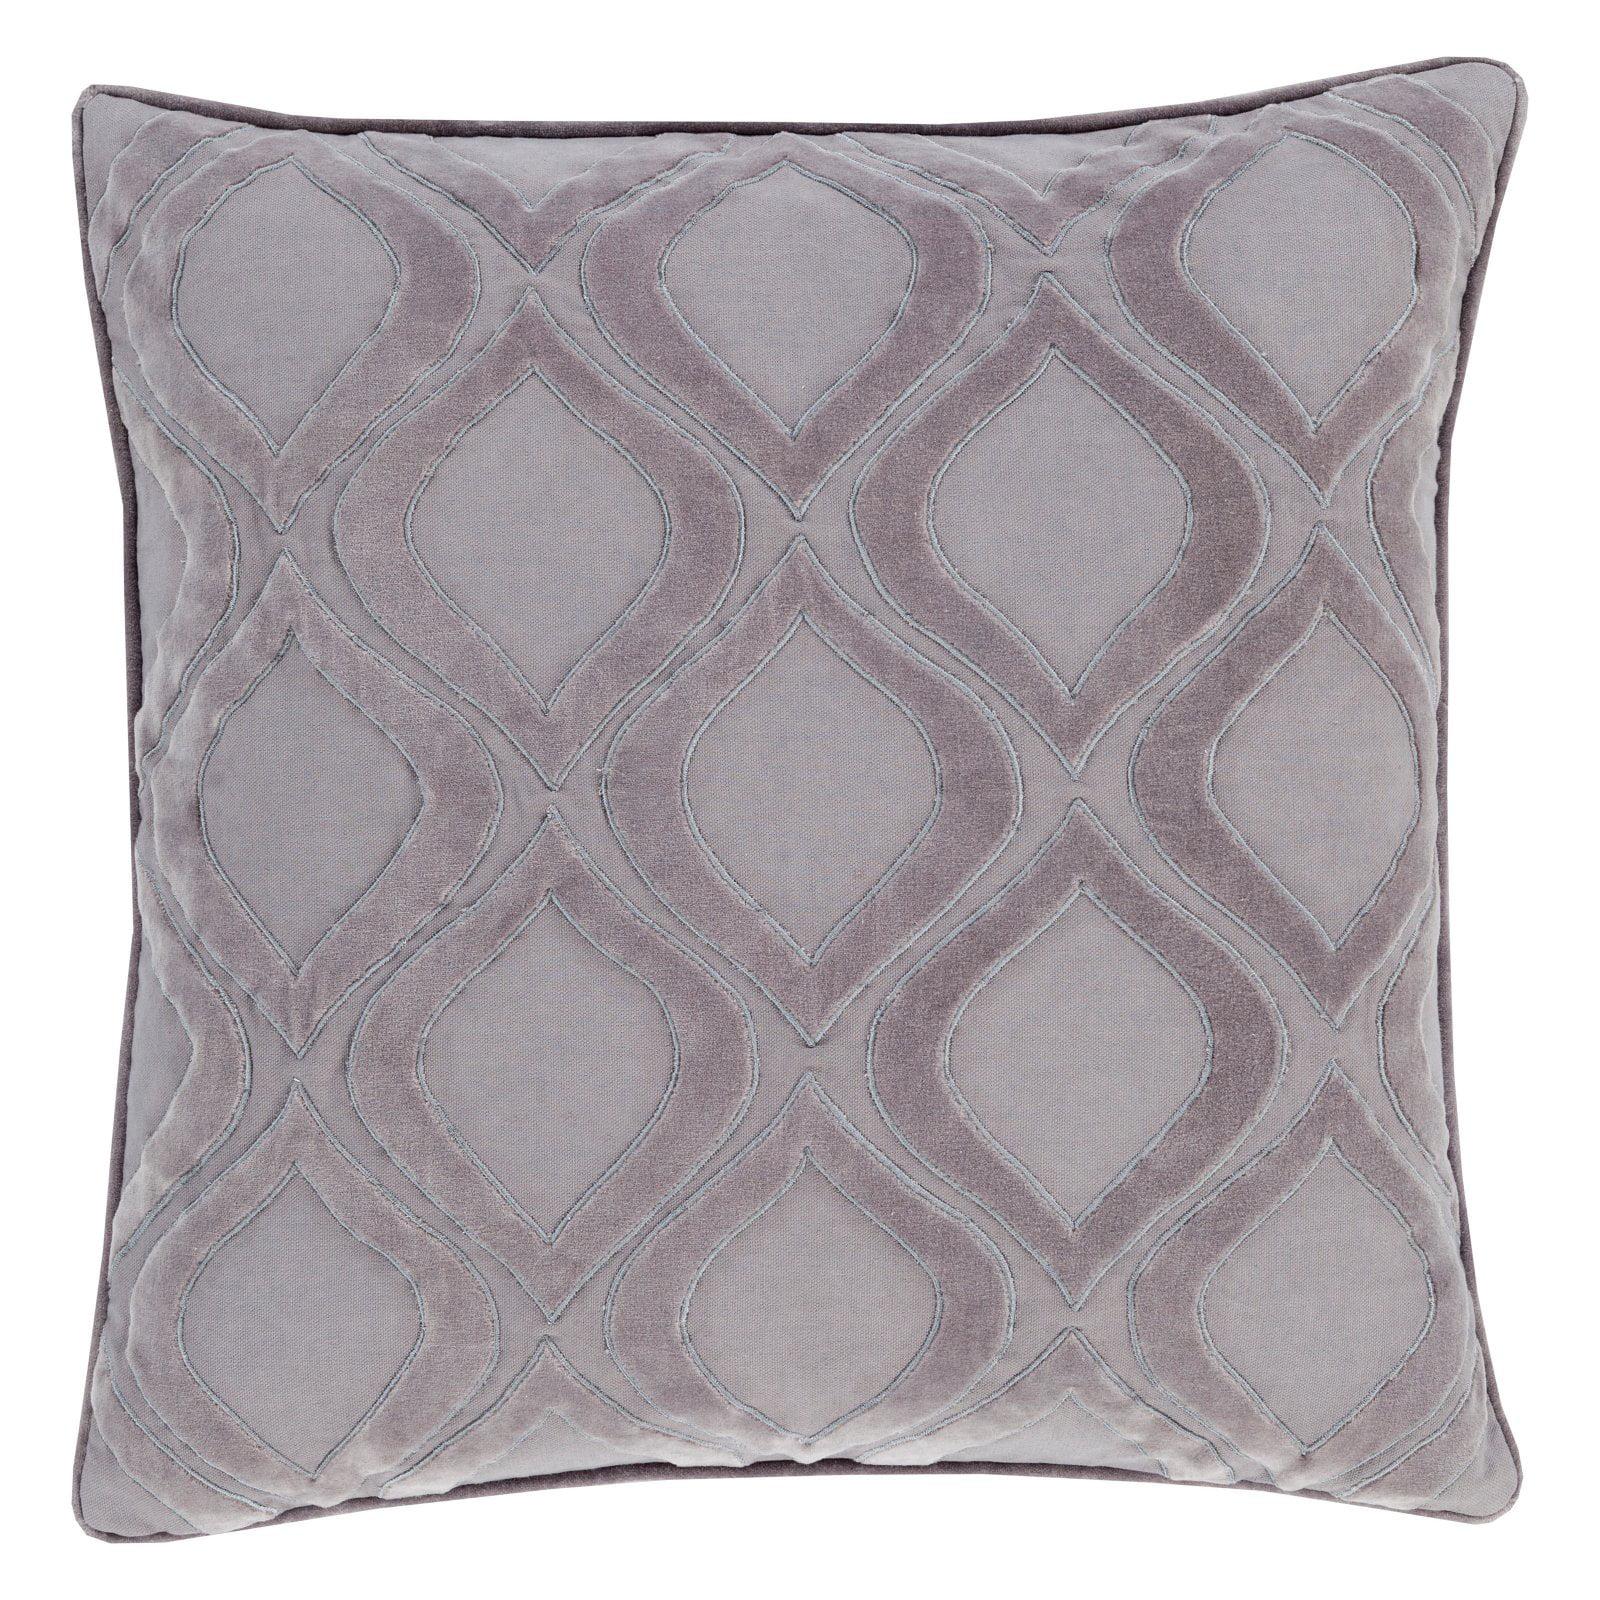 Surya Diamond and Cross Velvet Decorative Throw Pillow